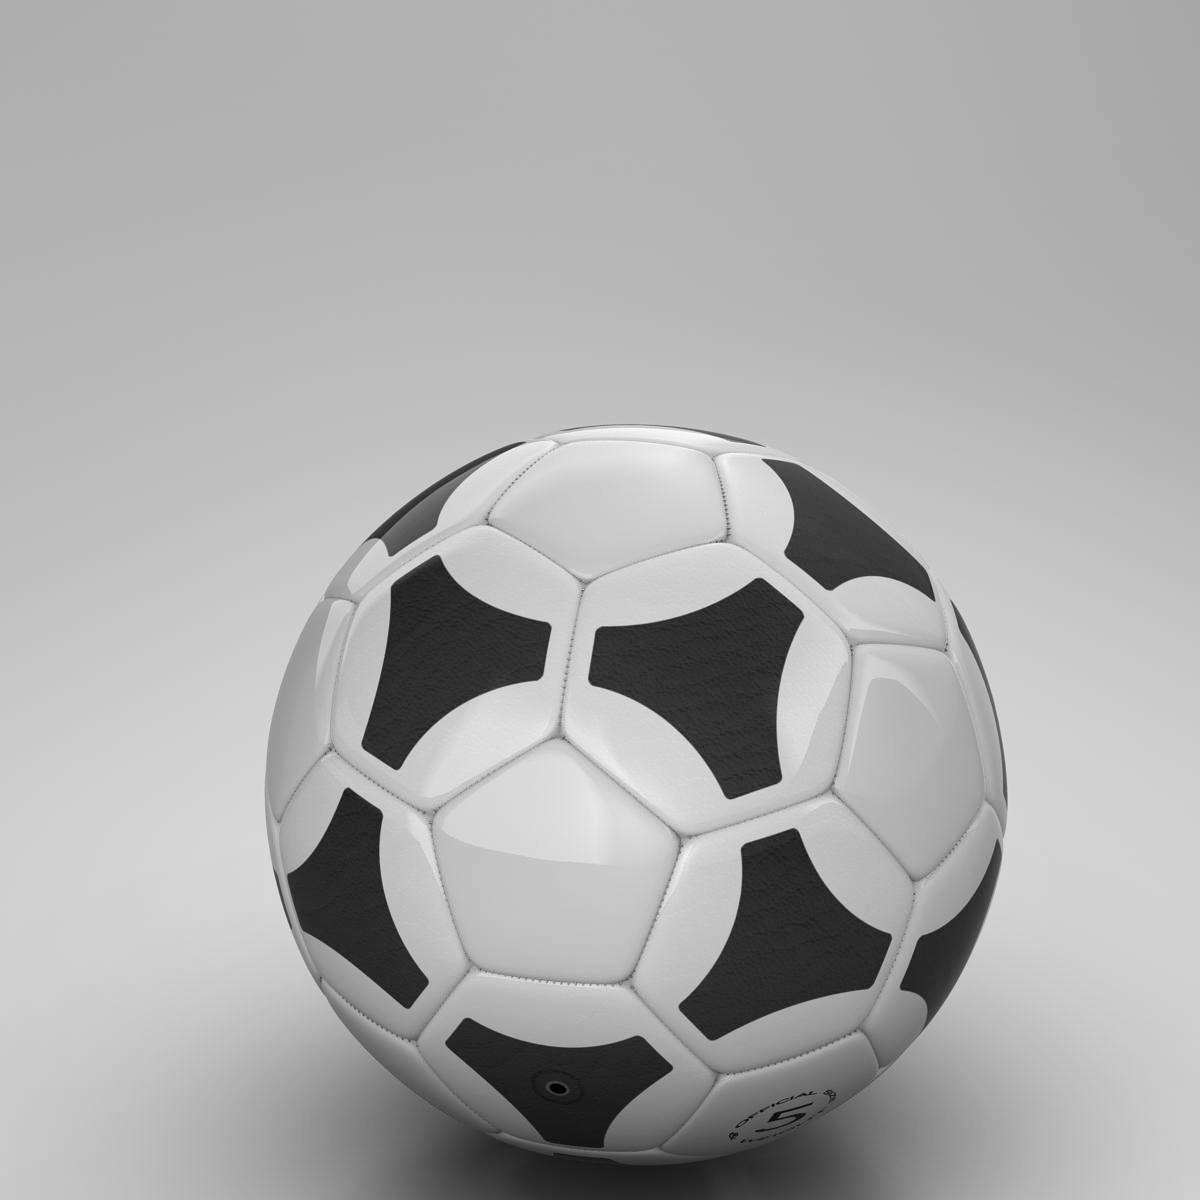 soccerball хар цагаан tri 3d загвар 3ds max fbx c4d ma mb obj 204054